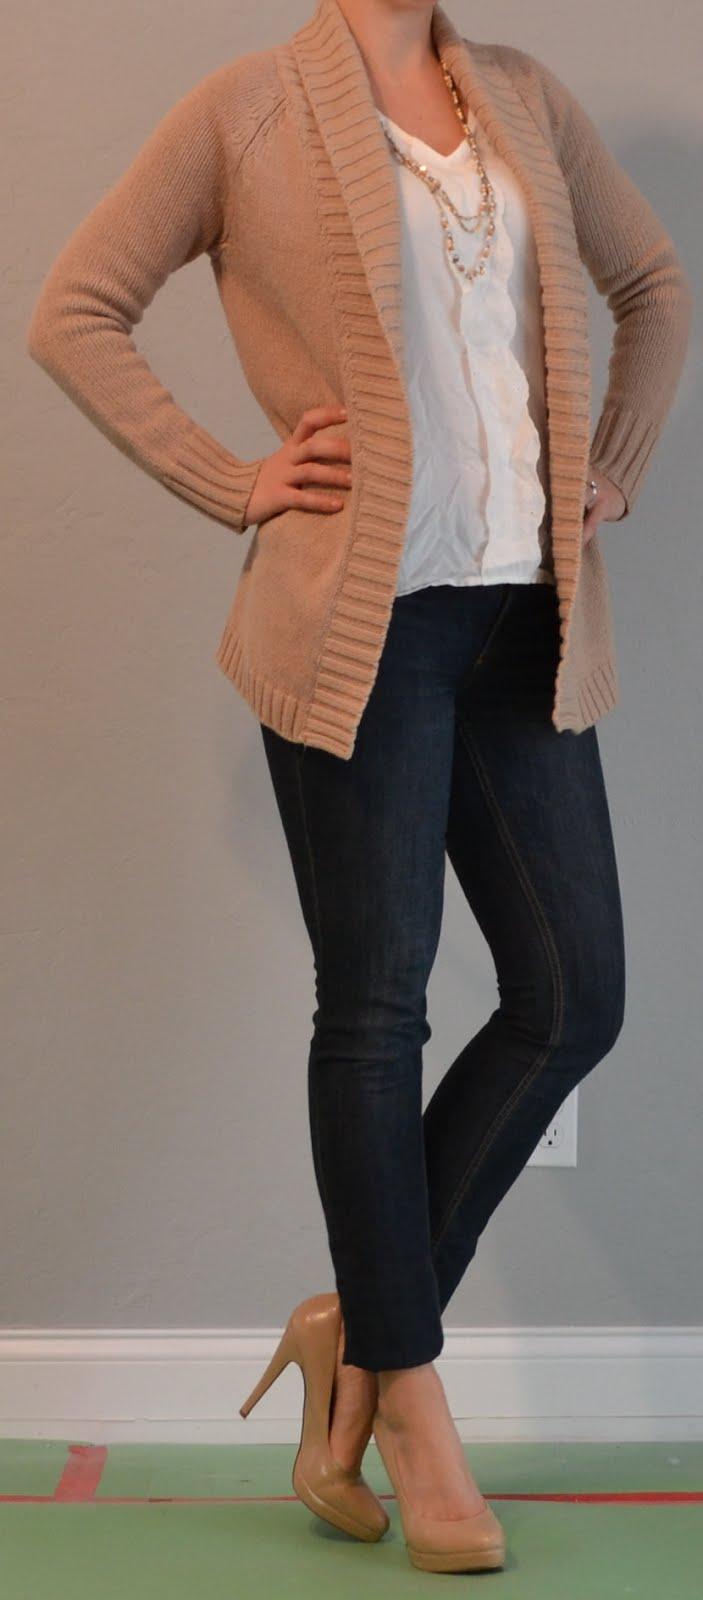 Skinny Jeans - Target